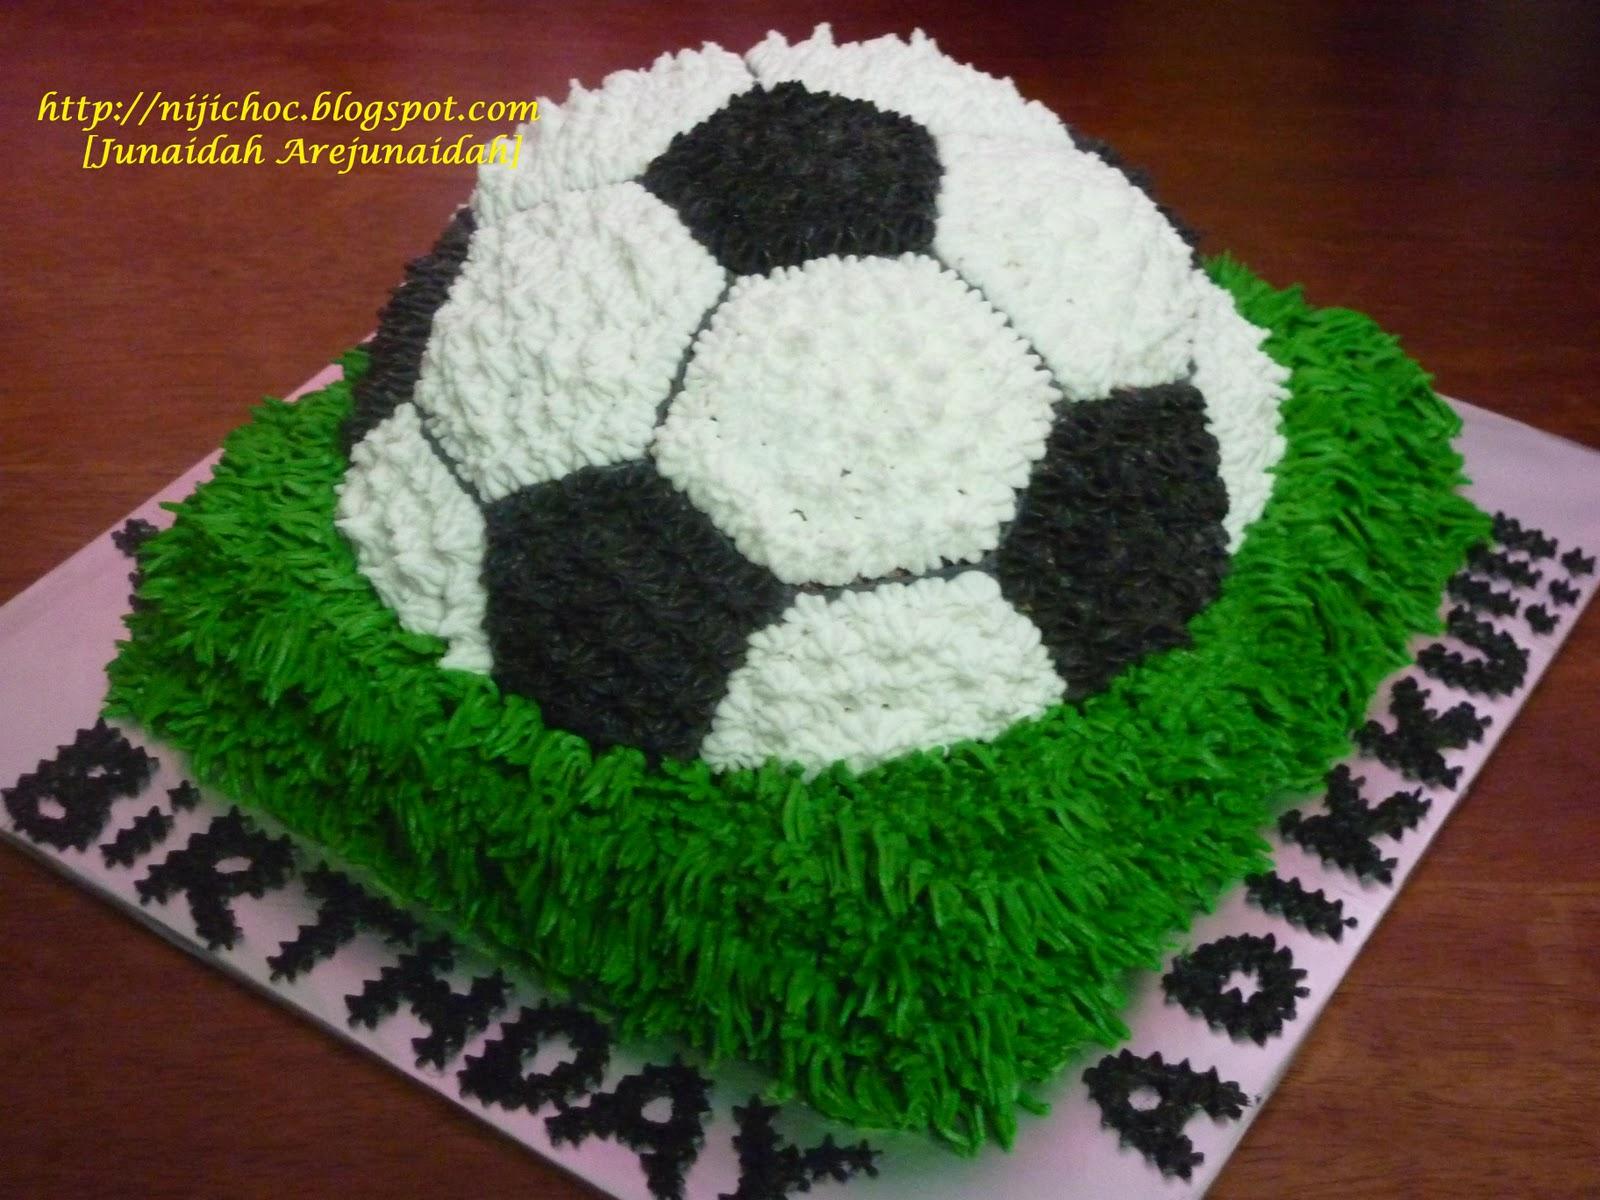 Niji Choc Alhamdulillahball Cake For Lil Bro Kotak Makan Duo Sunday Green Alhamdulillahsiap Kek Bola Happy Birthday Adikkutqvm Yek Nurulfor Ur Order With Choclenkali Leh G Eh Dik Hihihi